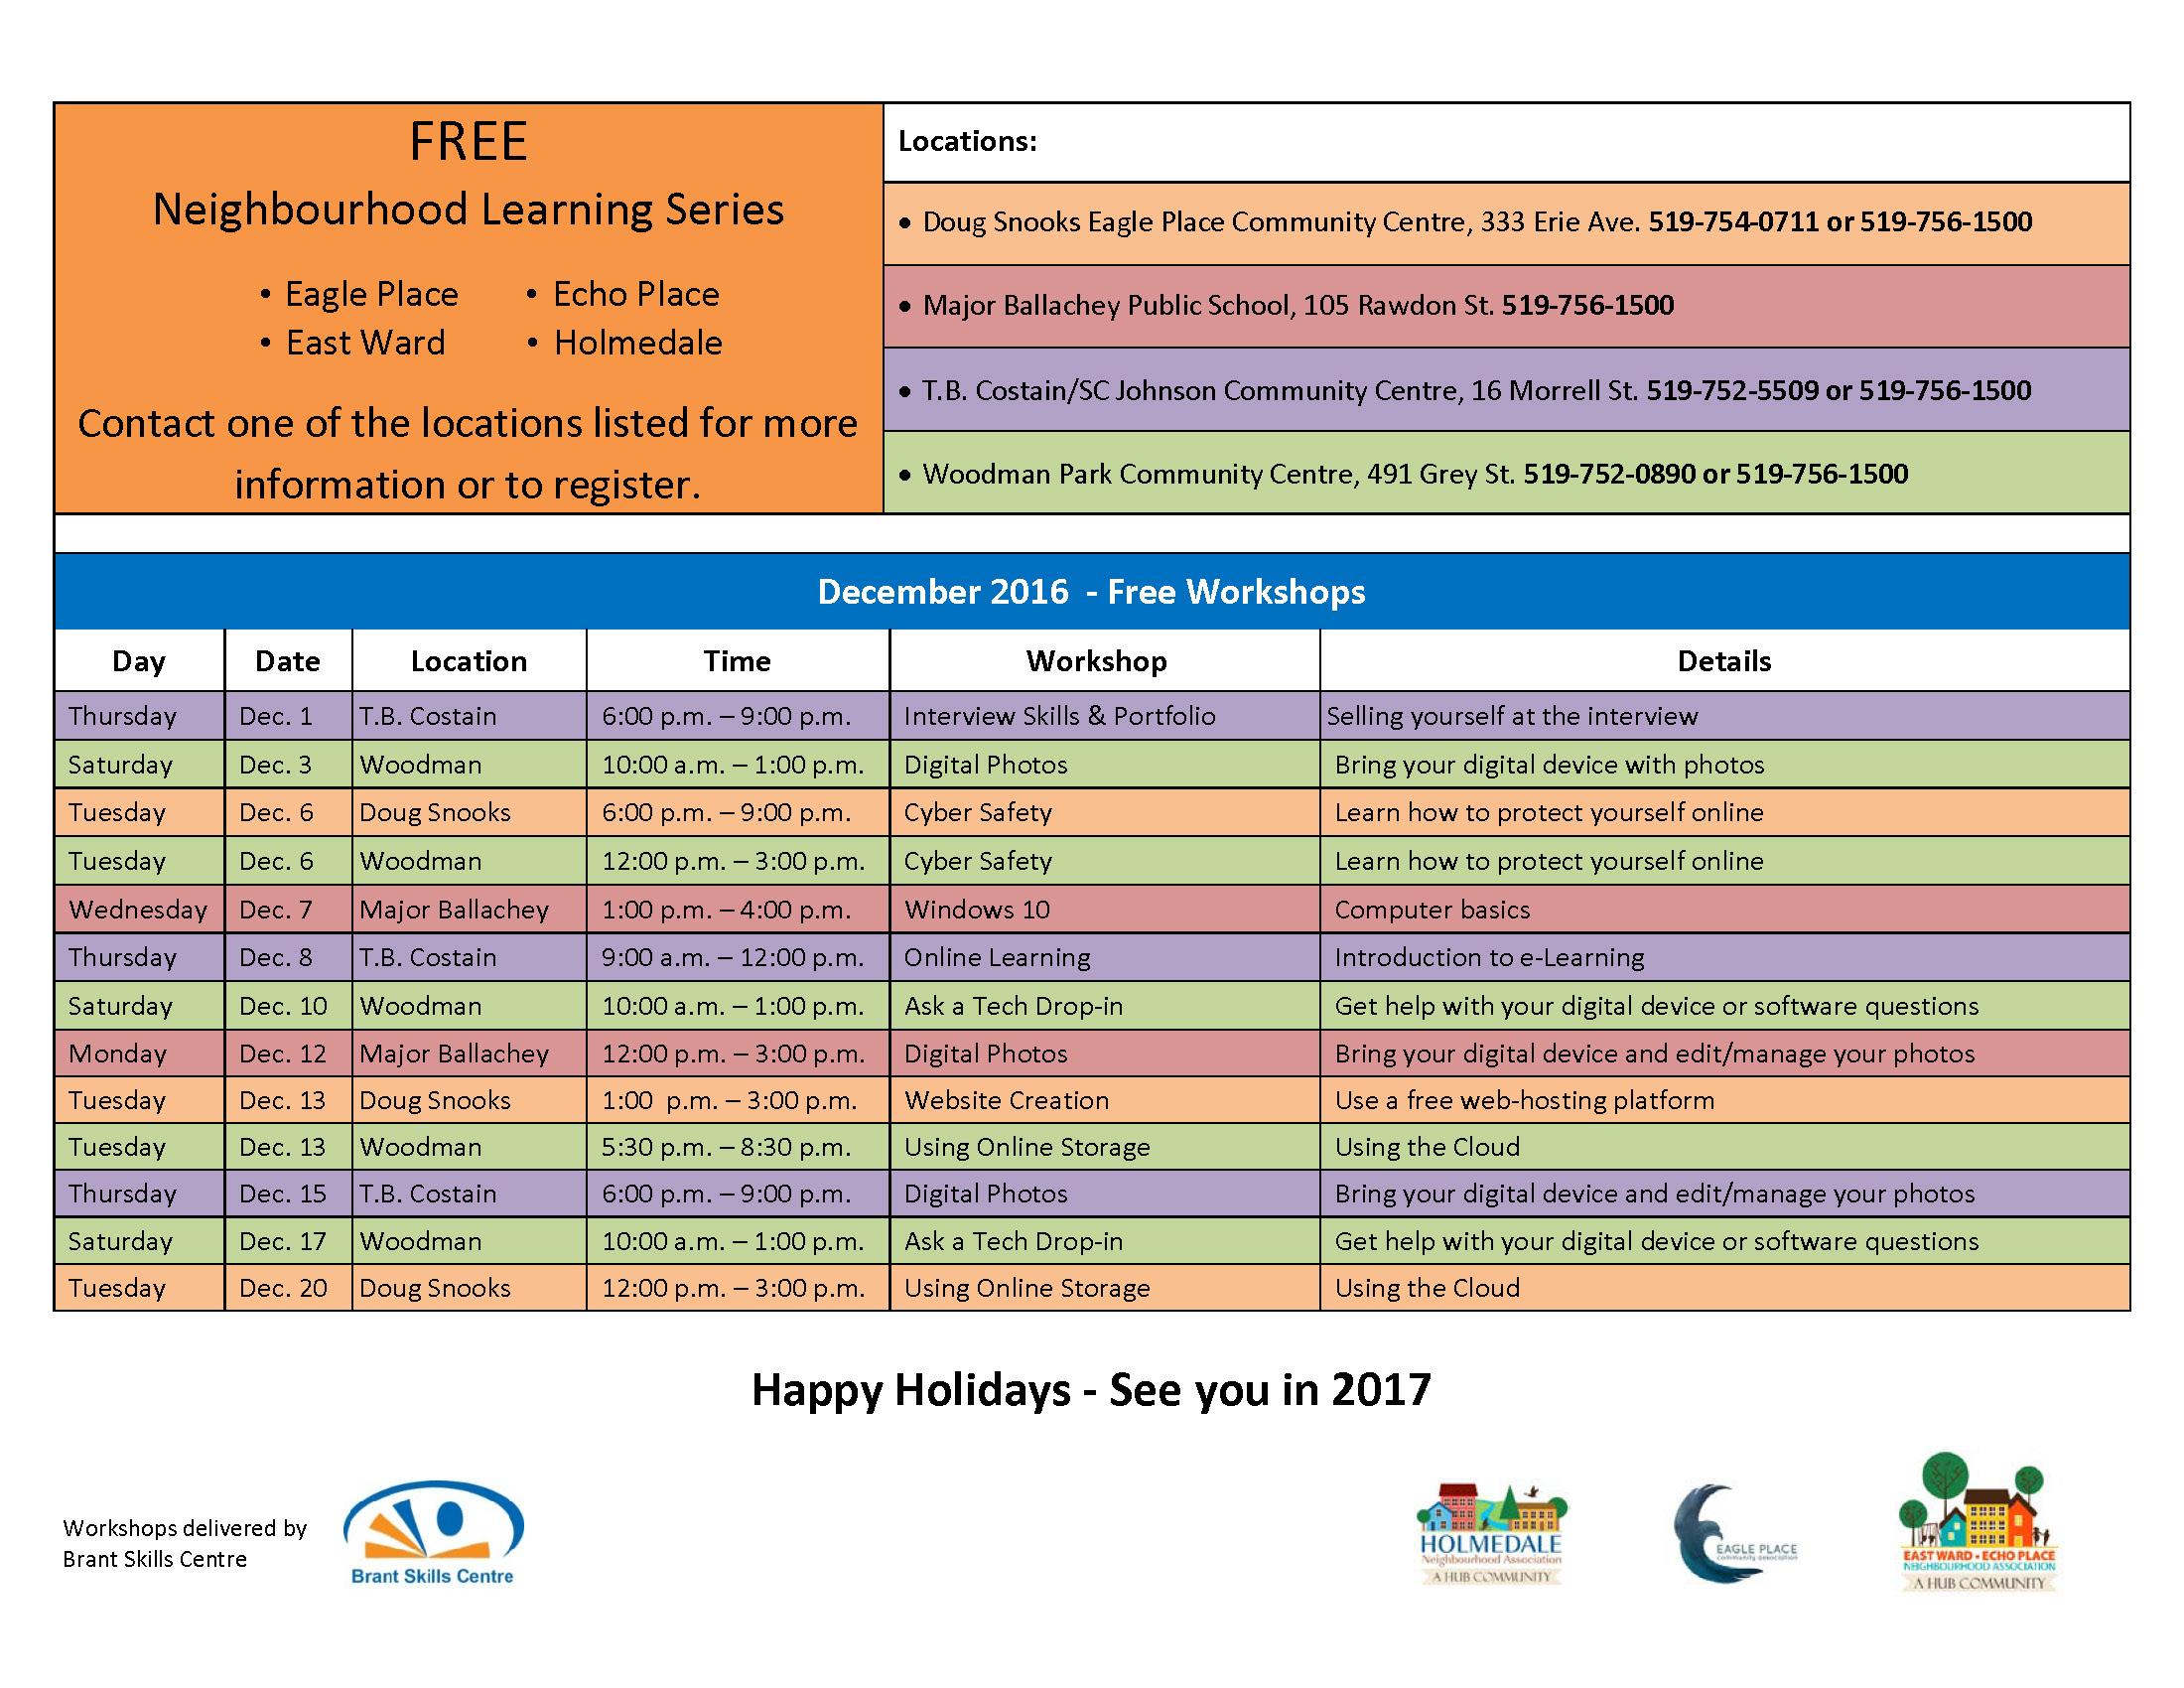 Free Learning Series Workshops – Brant Skills Centre